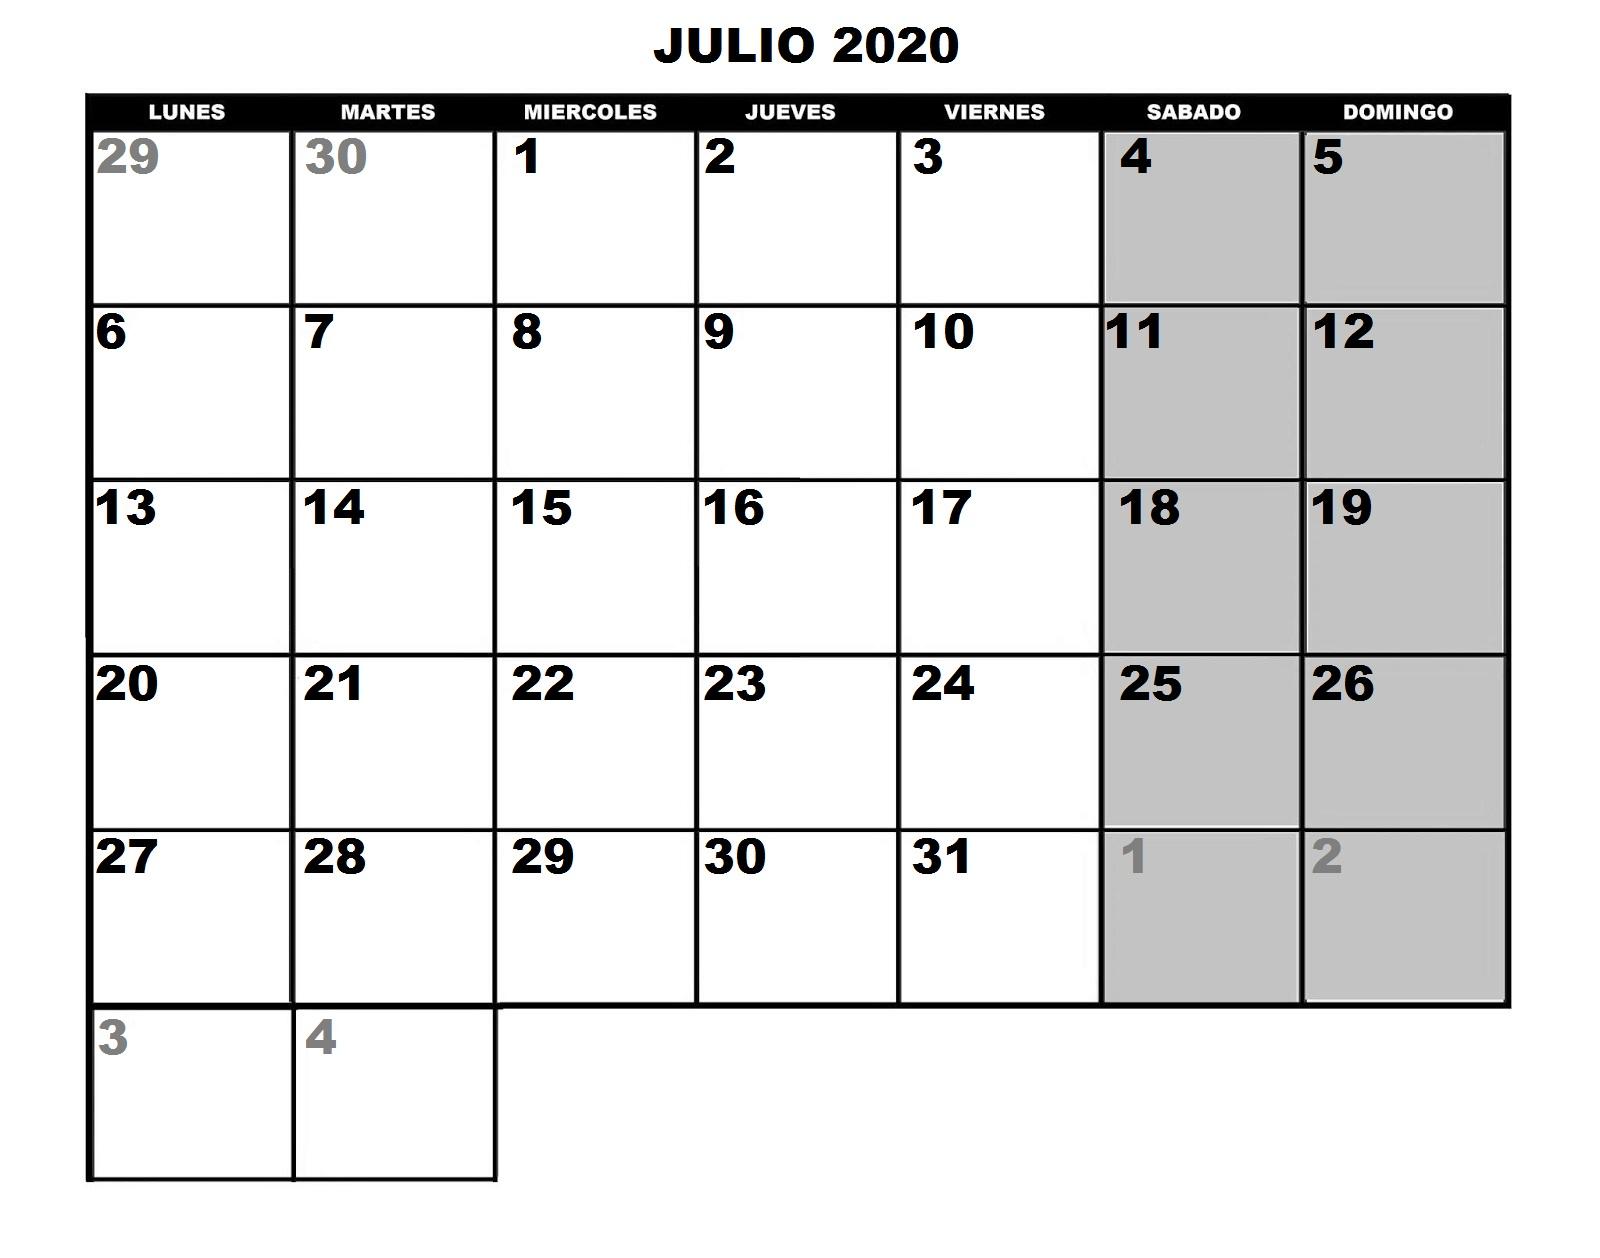 Calendario Julio 2020 Para Imprimir.Tornadojack Calendario 2020 Para Imprimir Y Poner Fotos A Cada